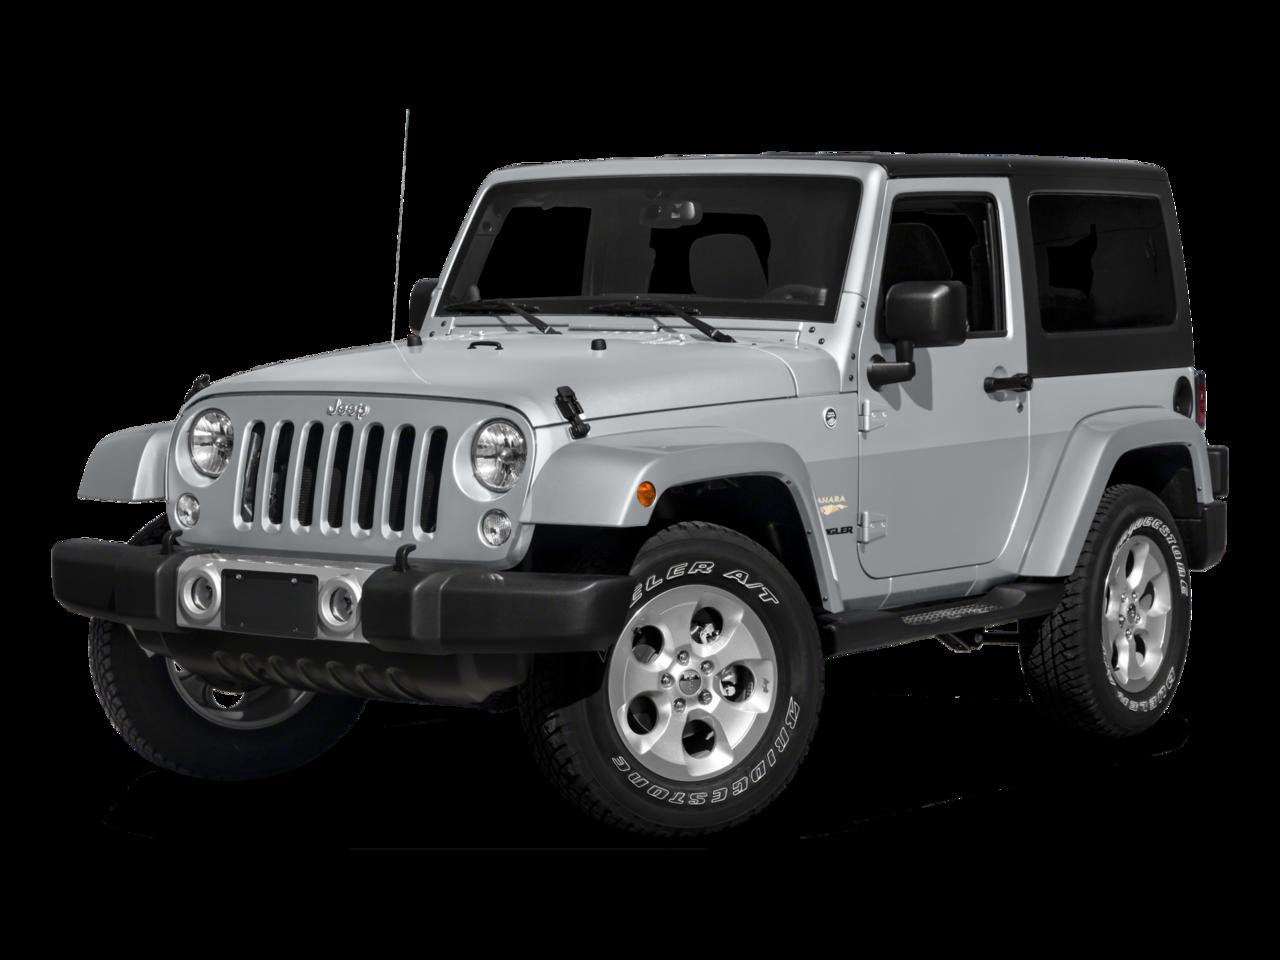 Hometown Motors Weiser Idaho >> Hometown Motors New Chrysler Dodge Jeep Ram | Autos Post